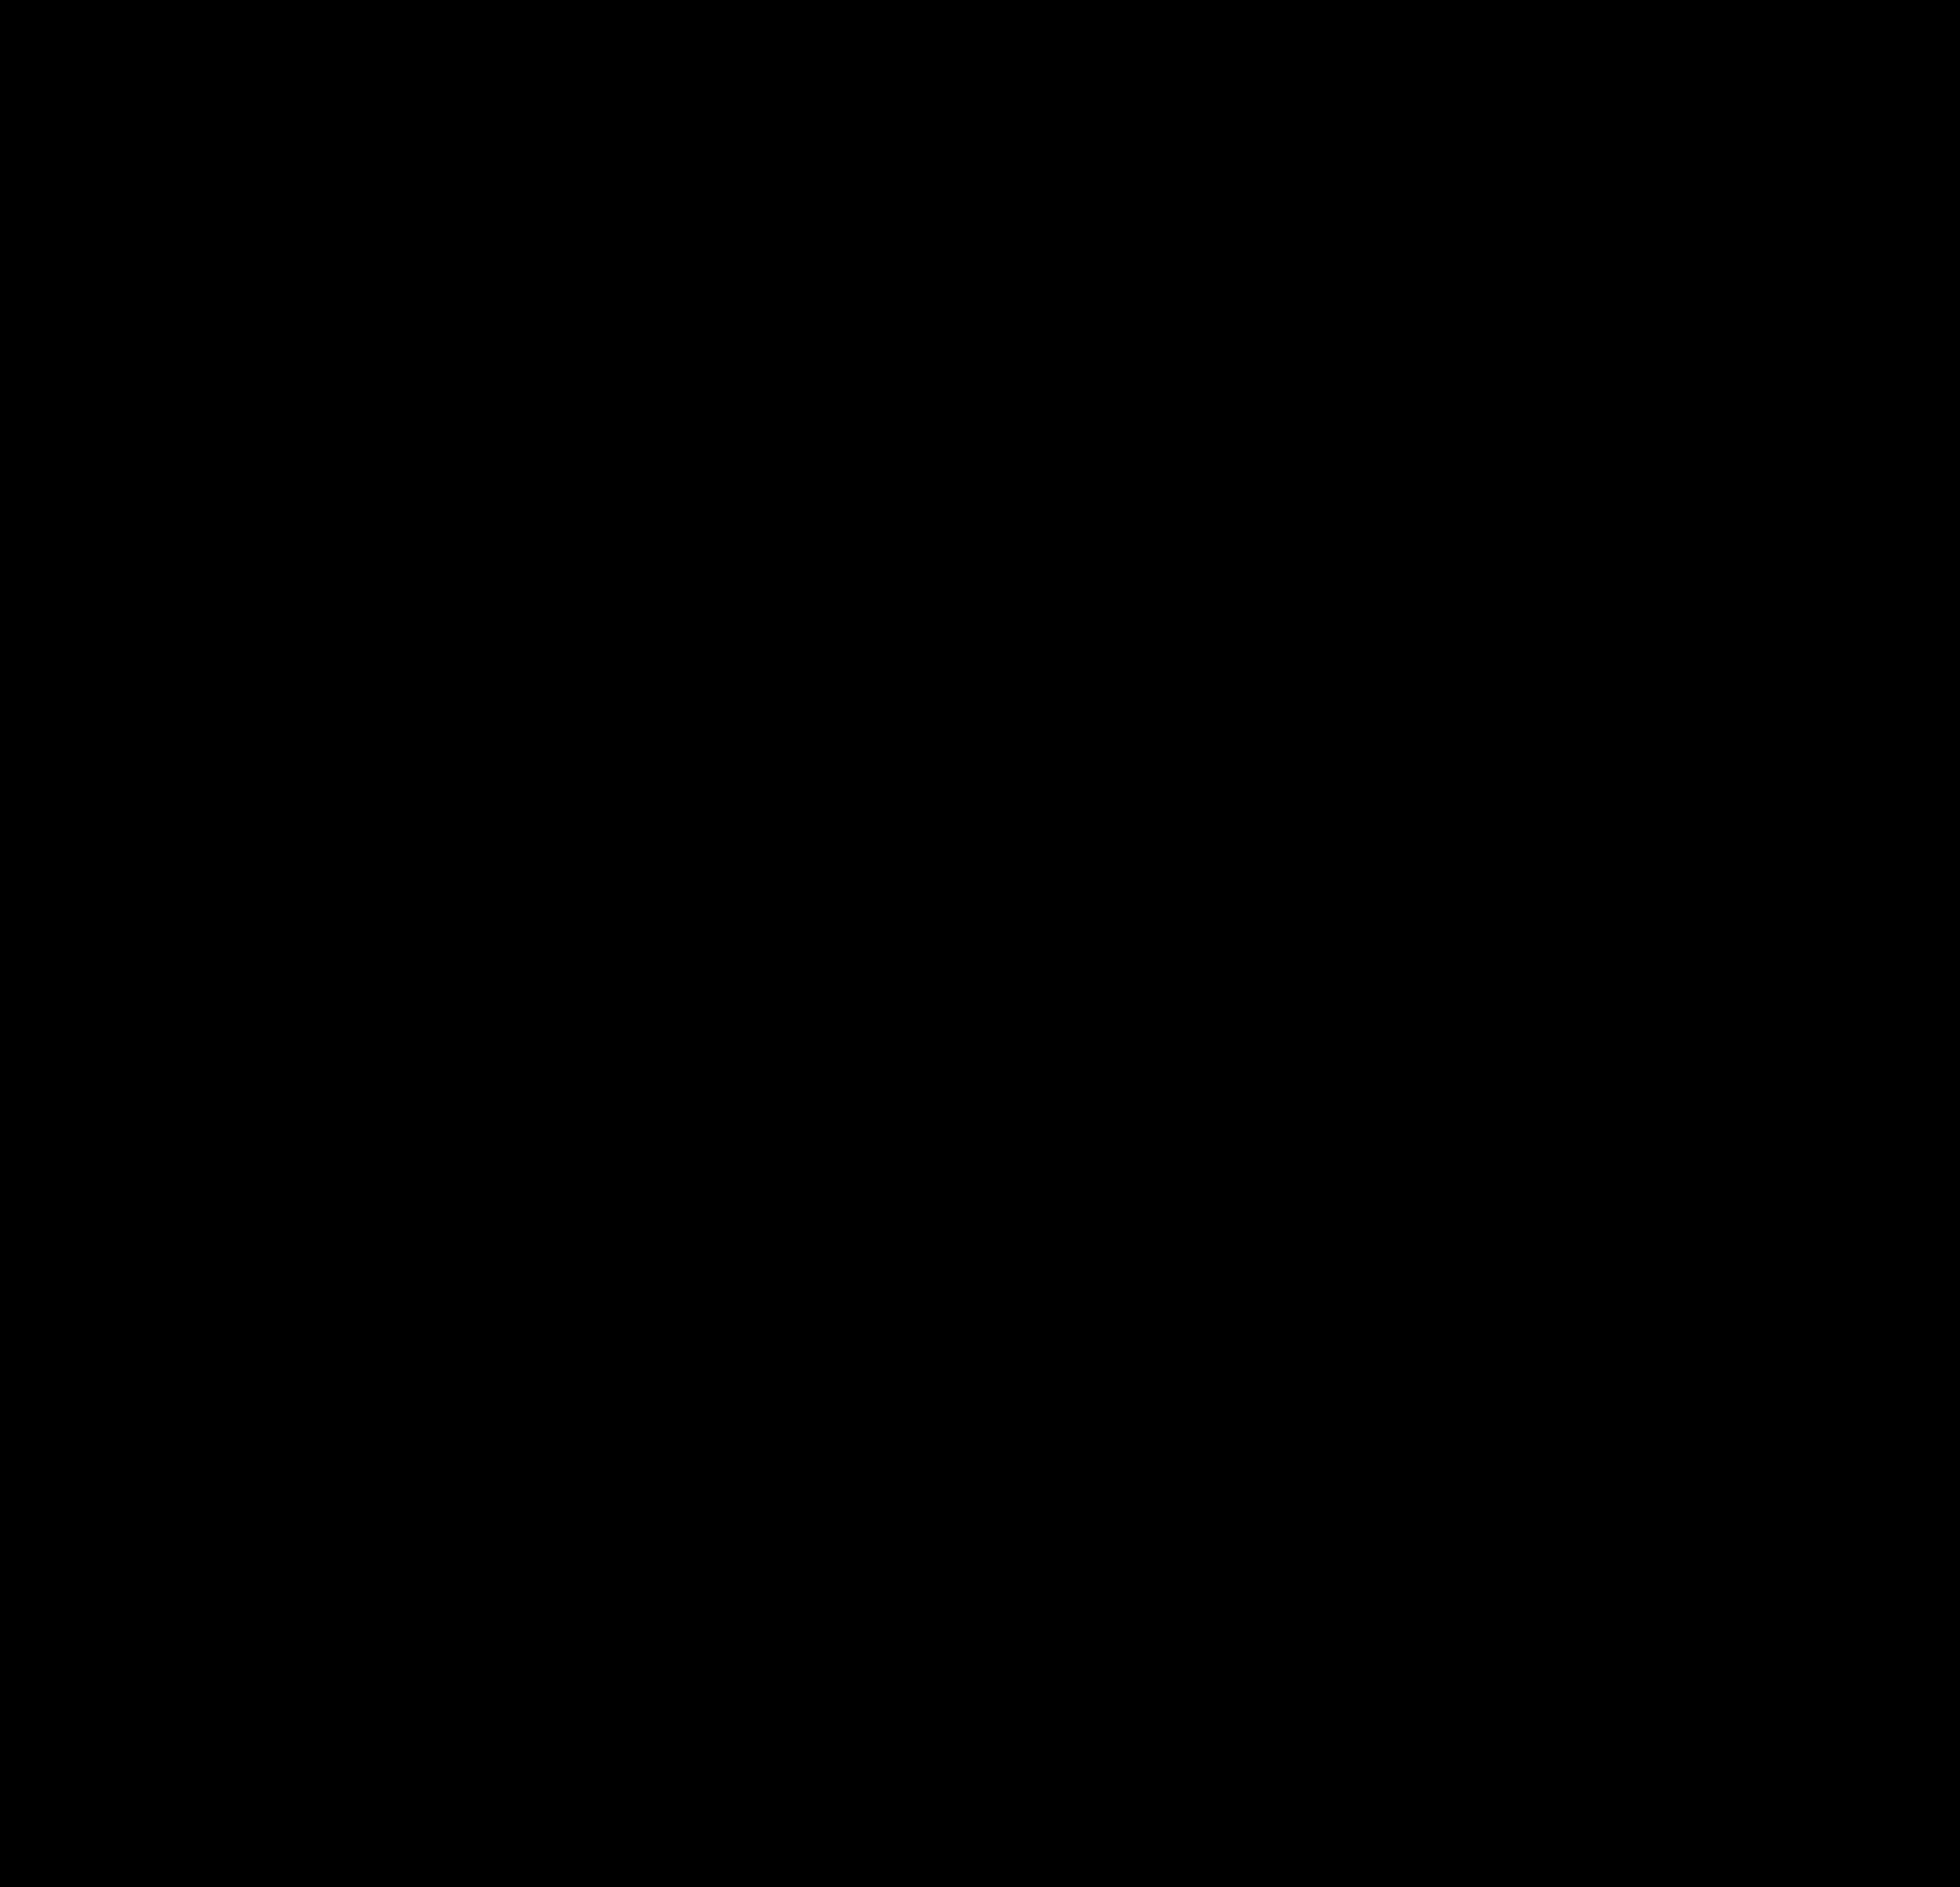 Artrilha